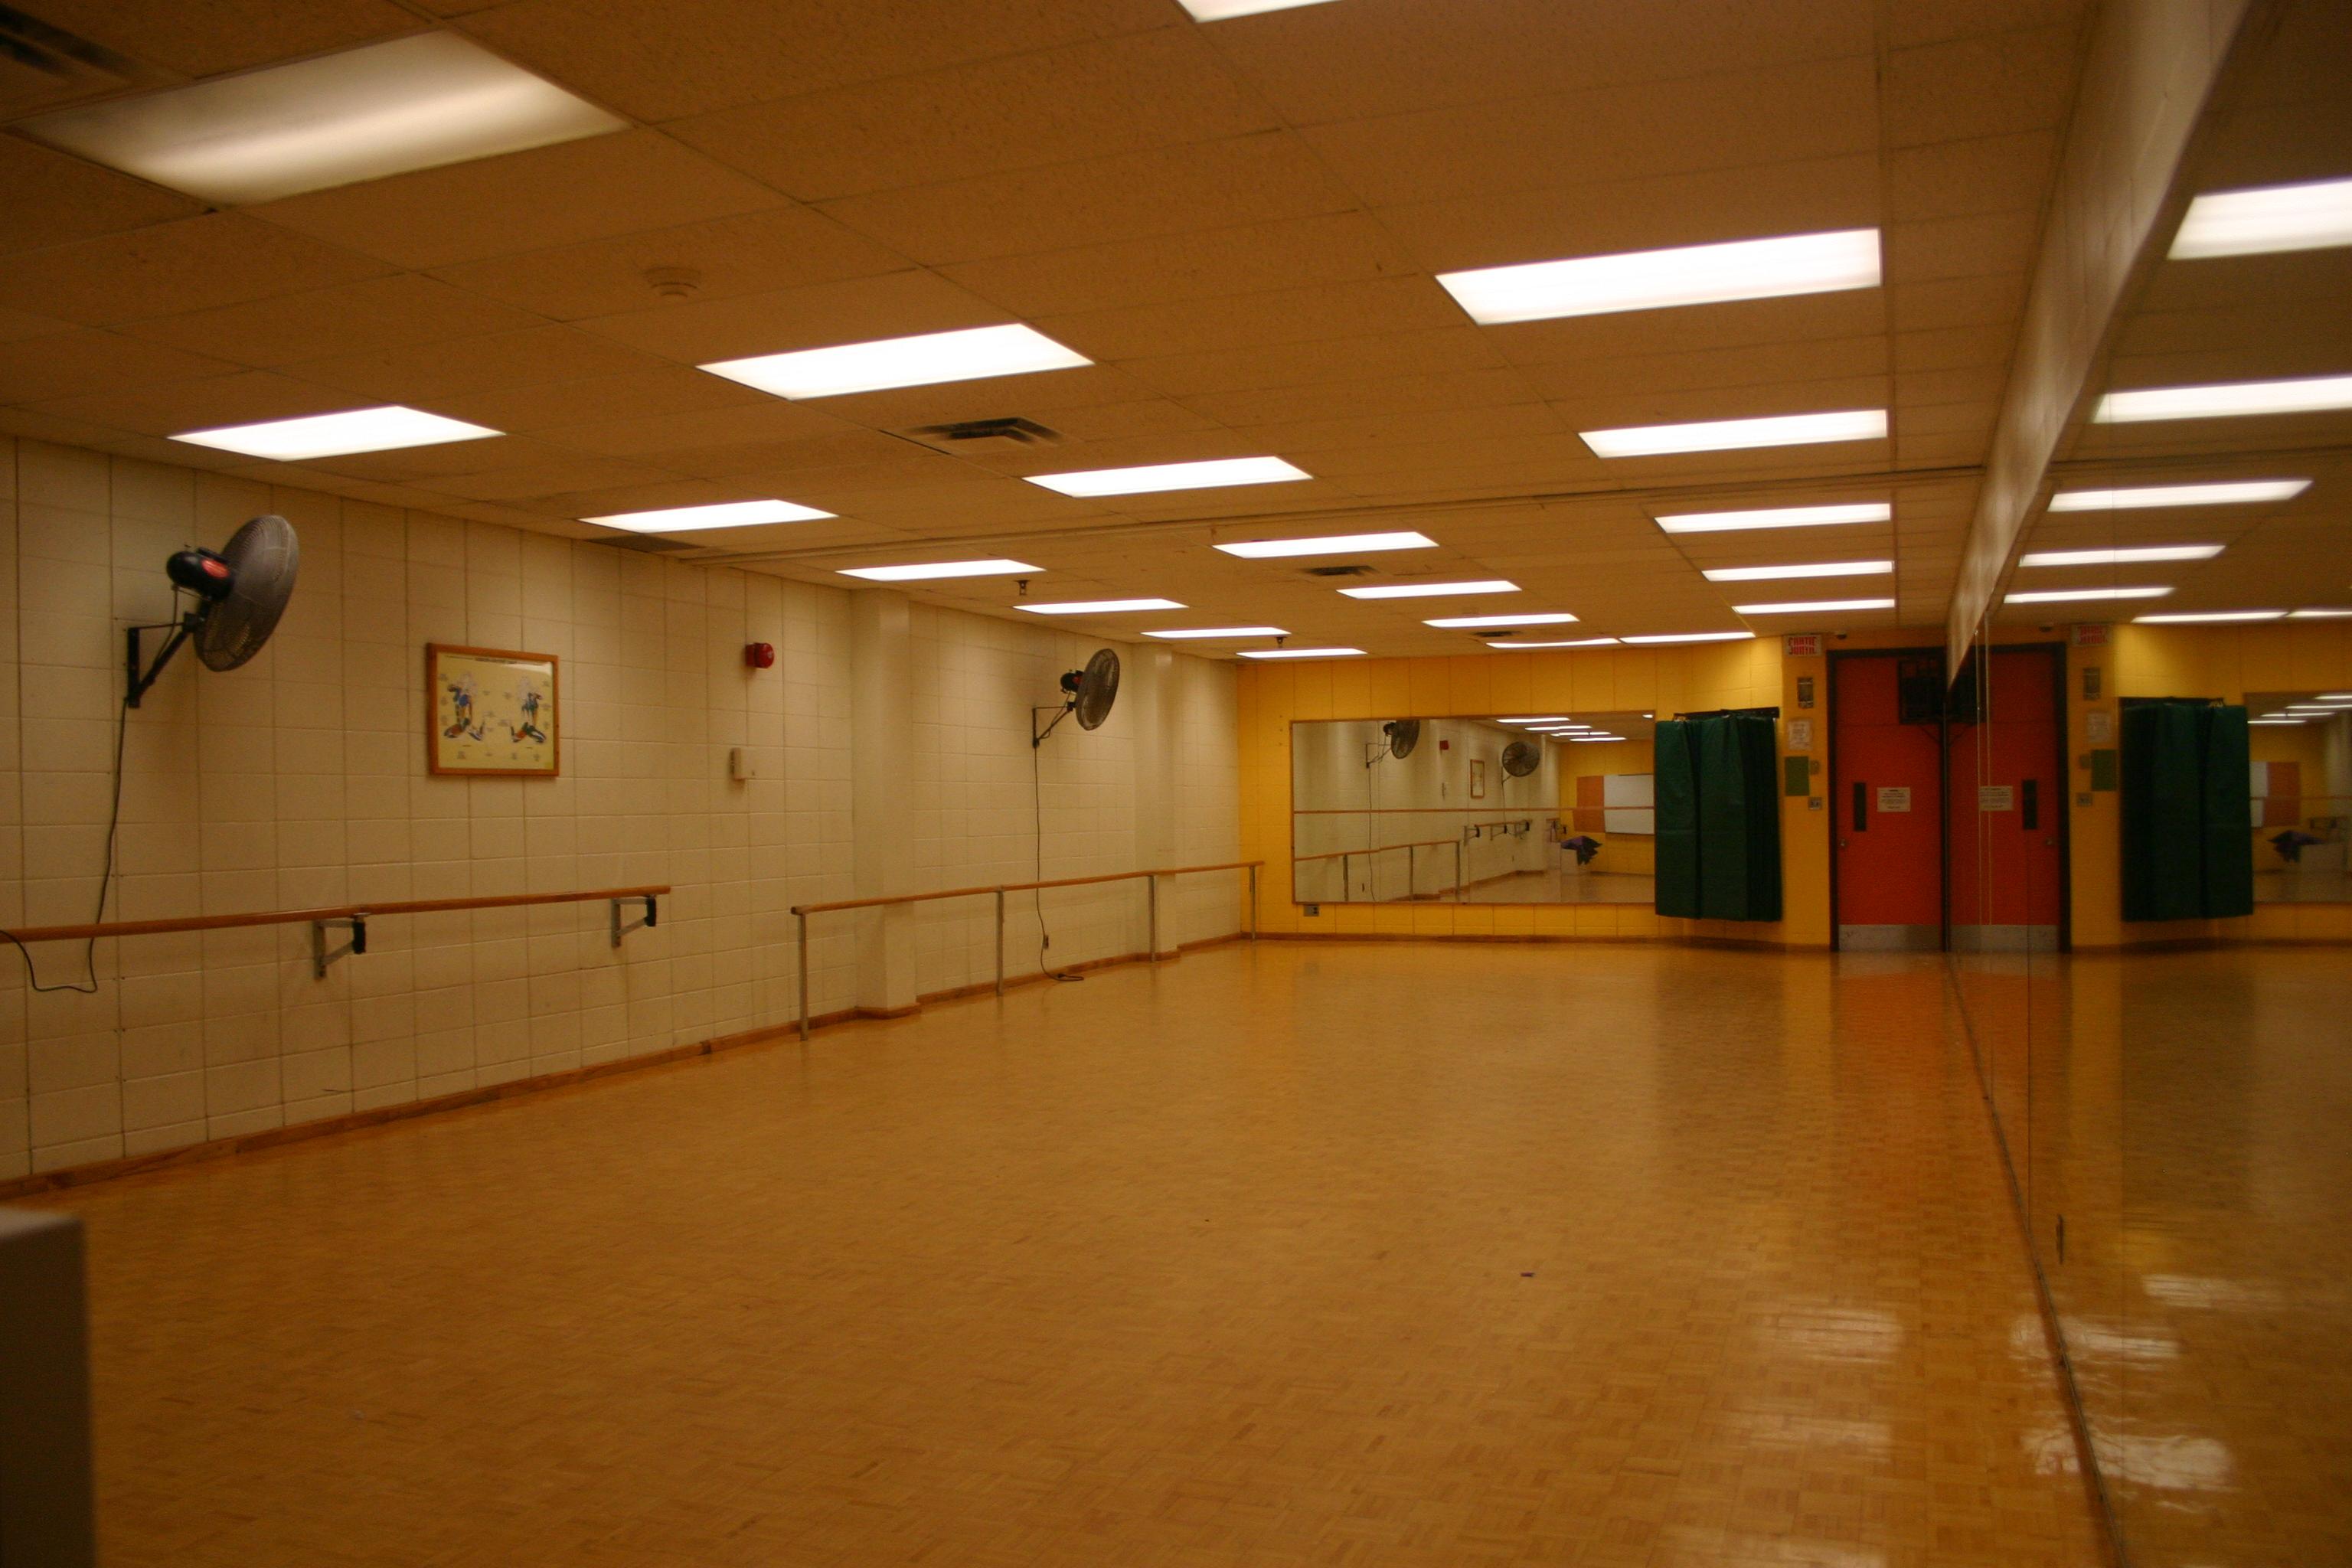 Dance Room Sports Recreation Cegep Vanier College